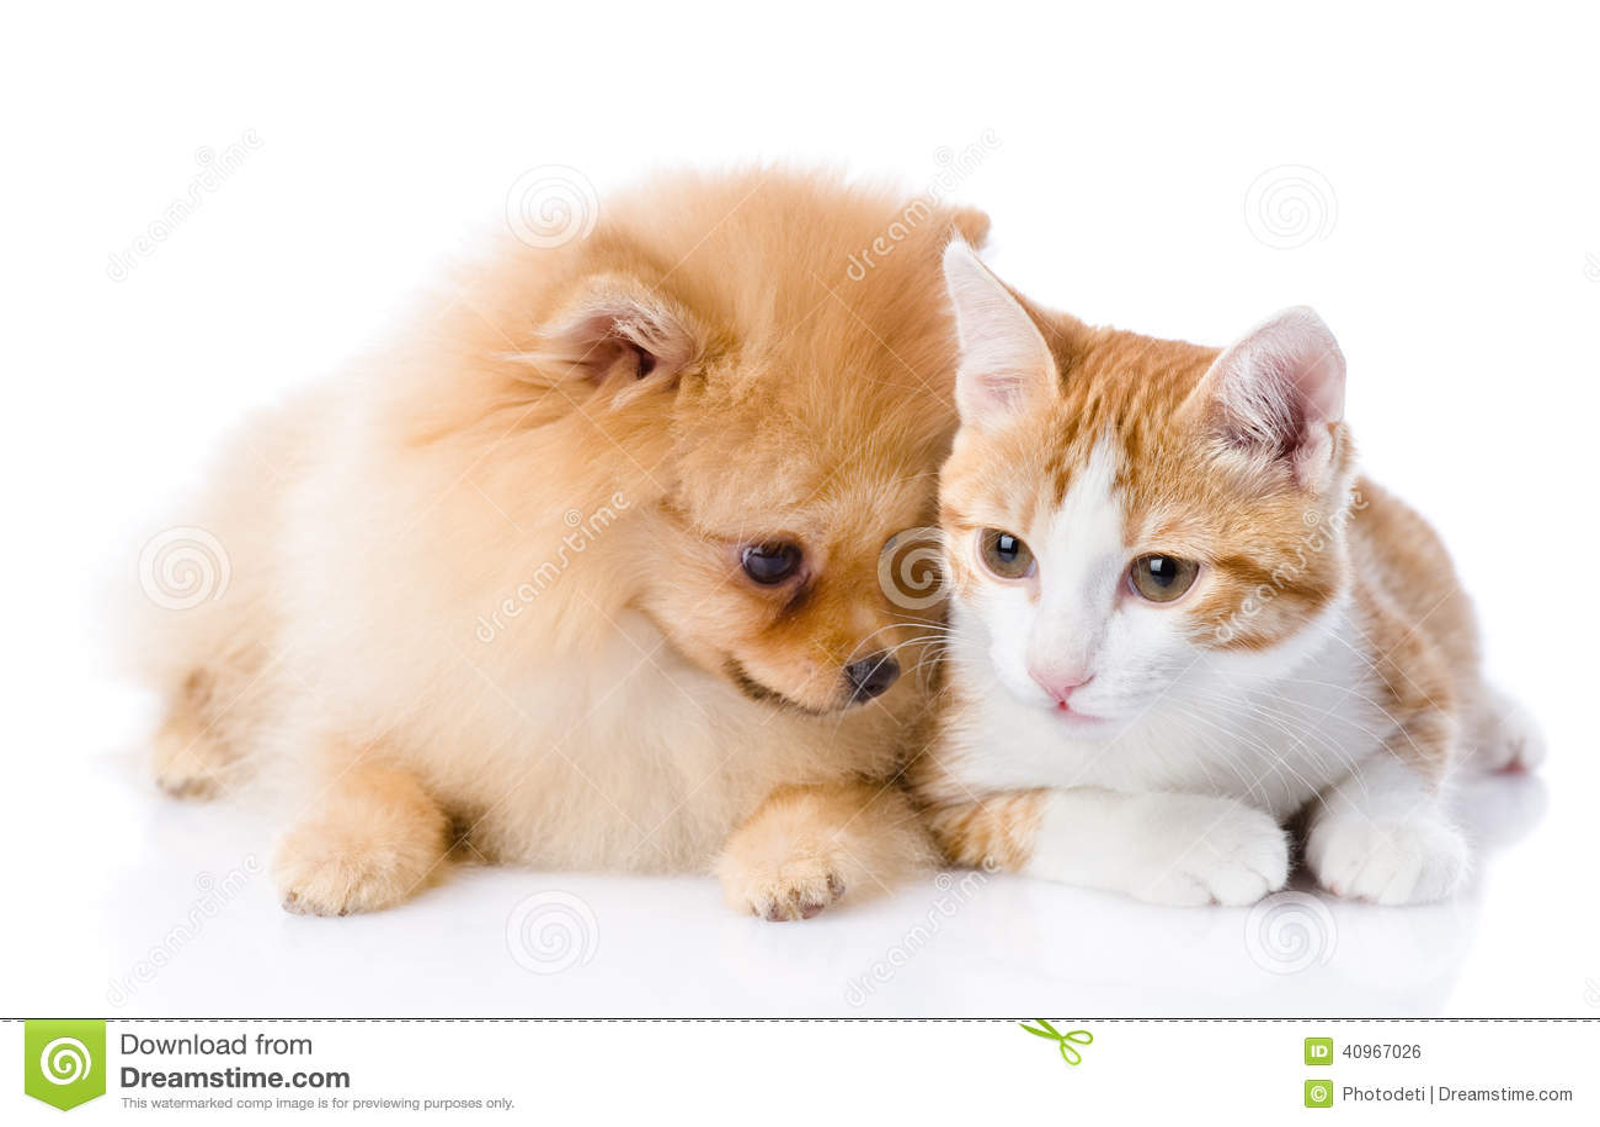 Oranje kat en spitz hond samen